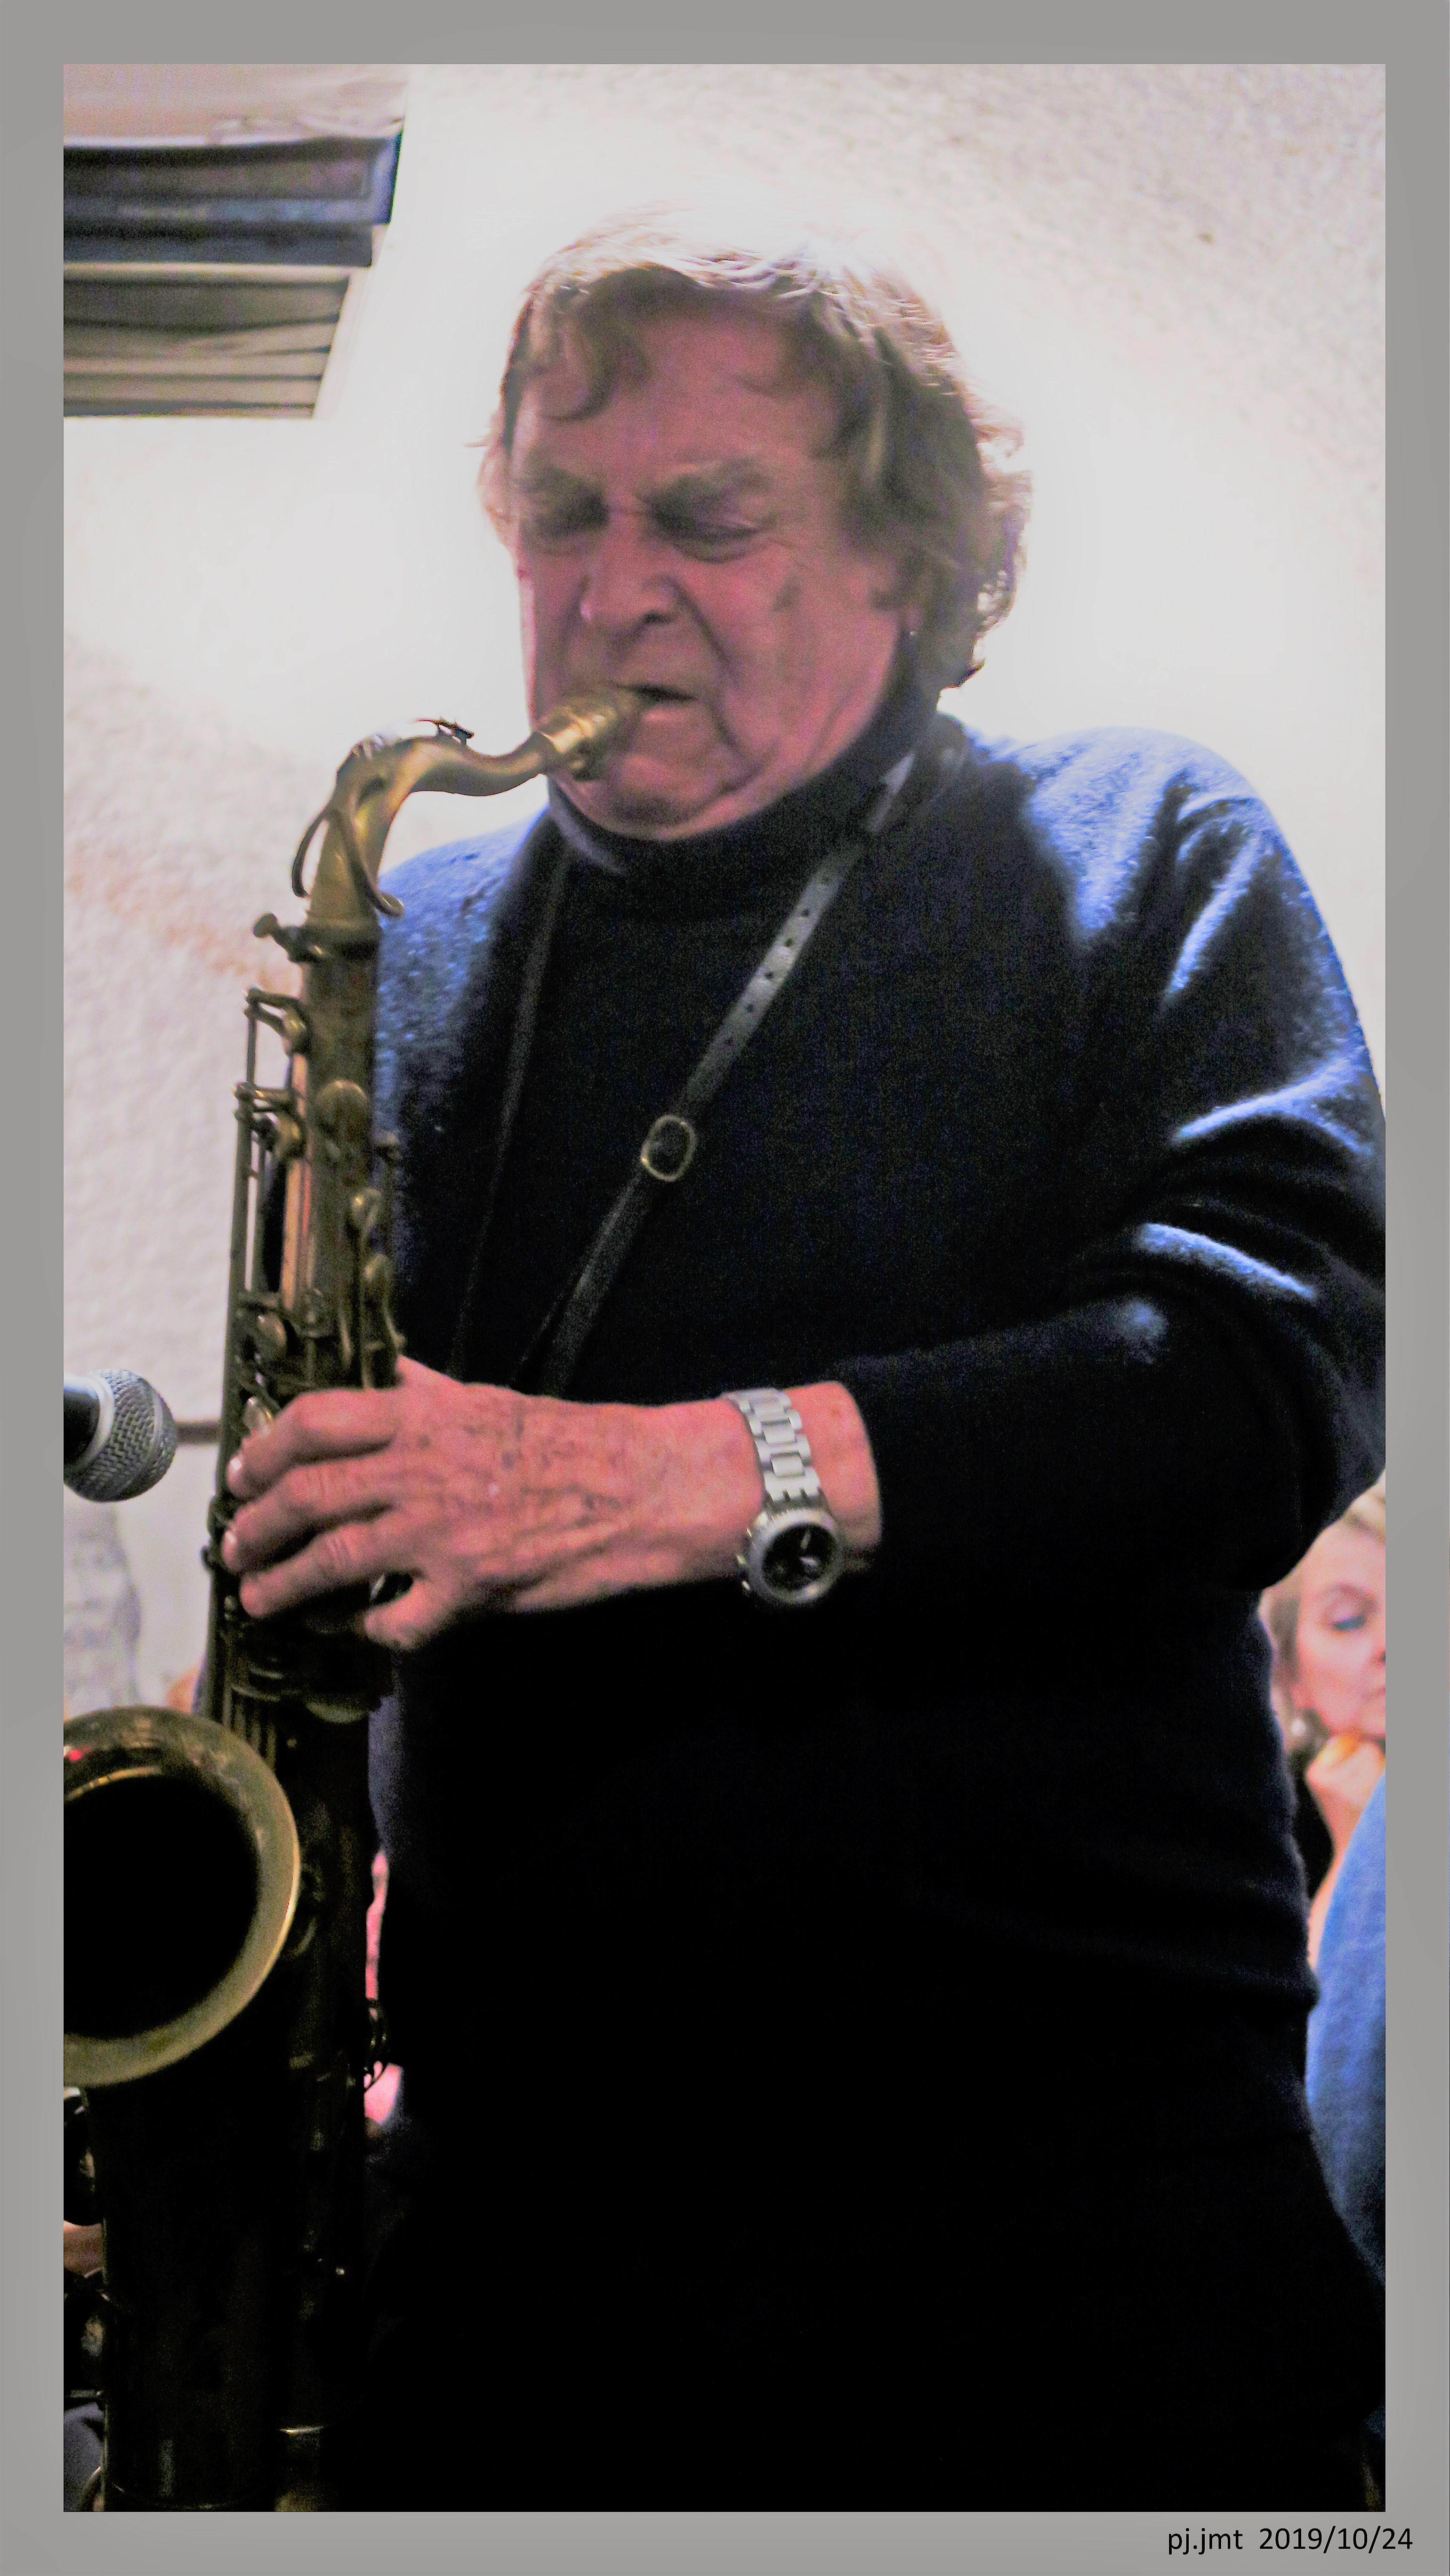 Stéphane Guérault